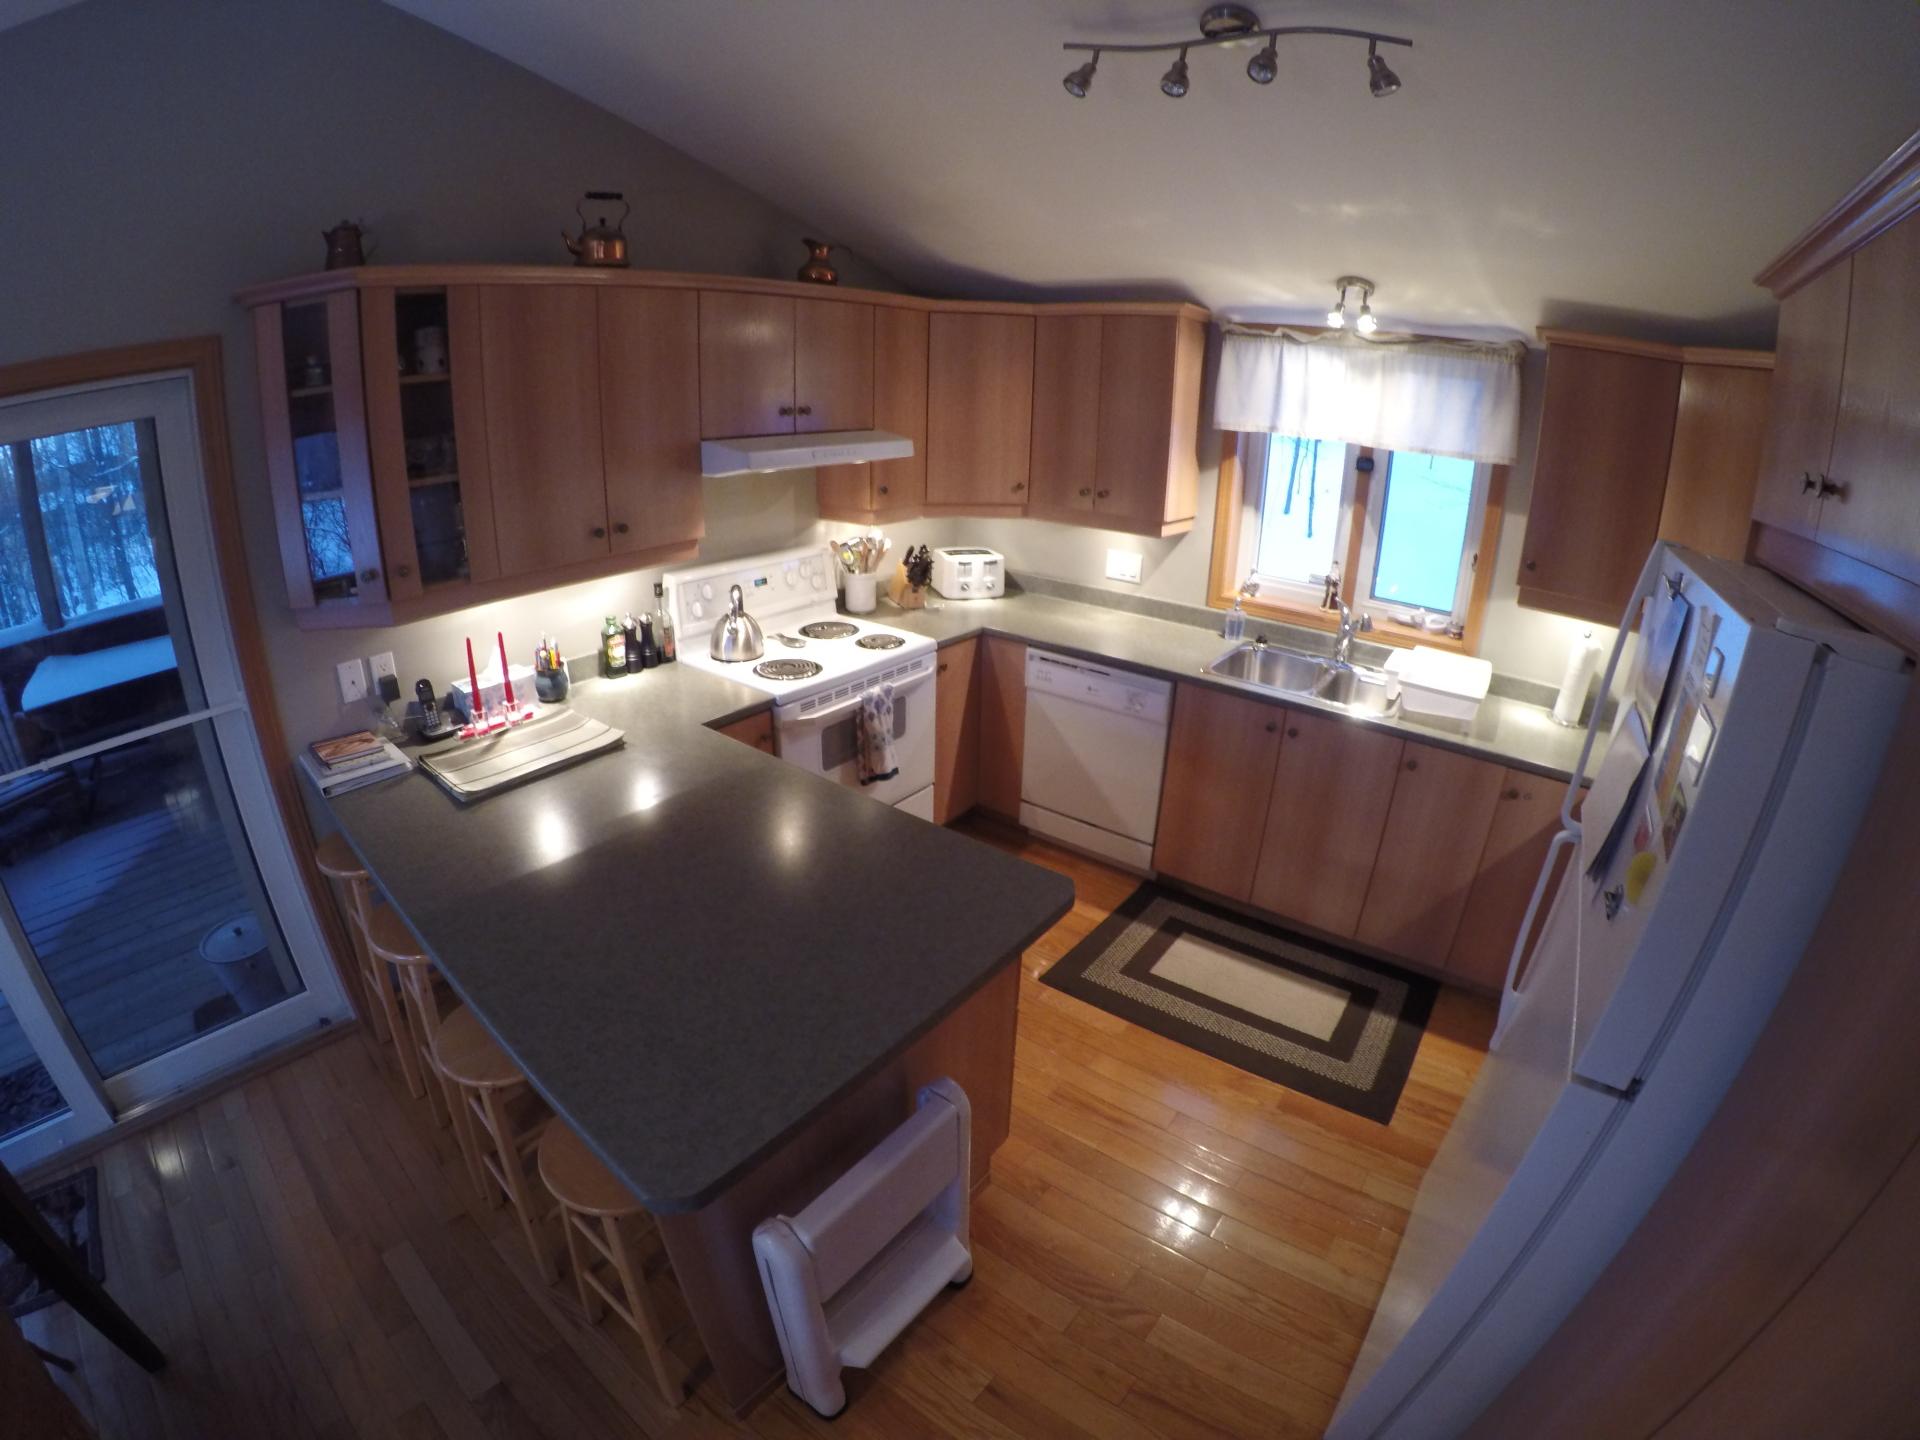 Cuisine de la salle à manger / Kitchen From Dinningroom